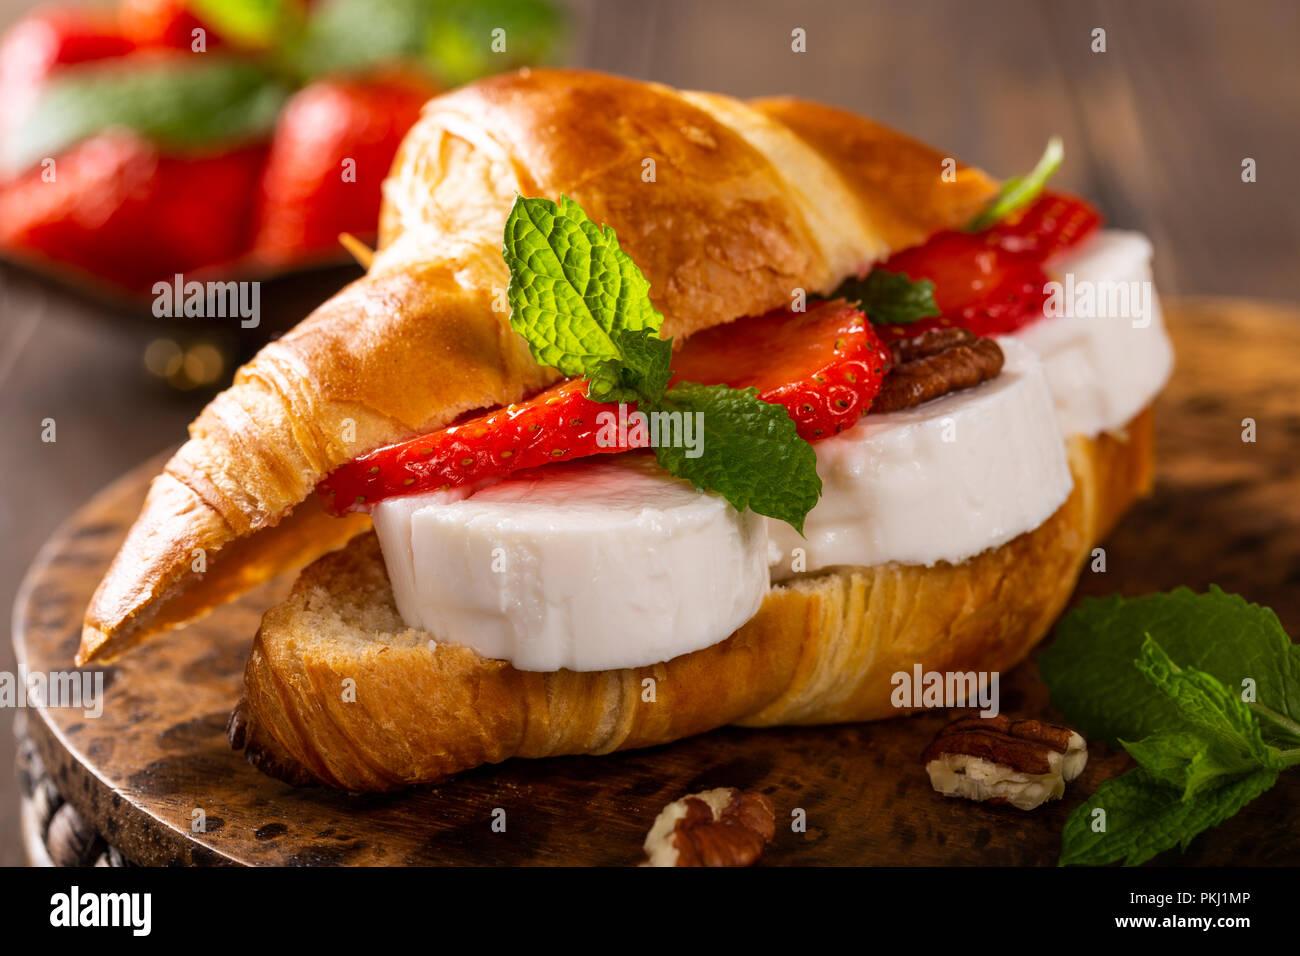 Honey Bun Stock Photos Images Alamy Mps Whitehoney Sandwich Croissant With Goat Cheese Image